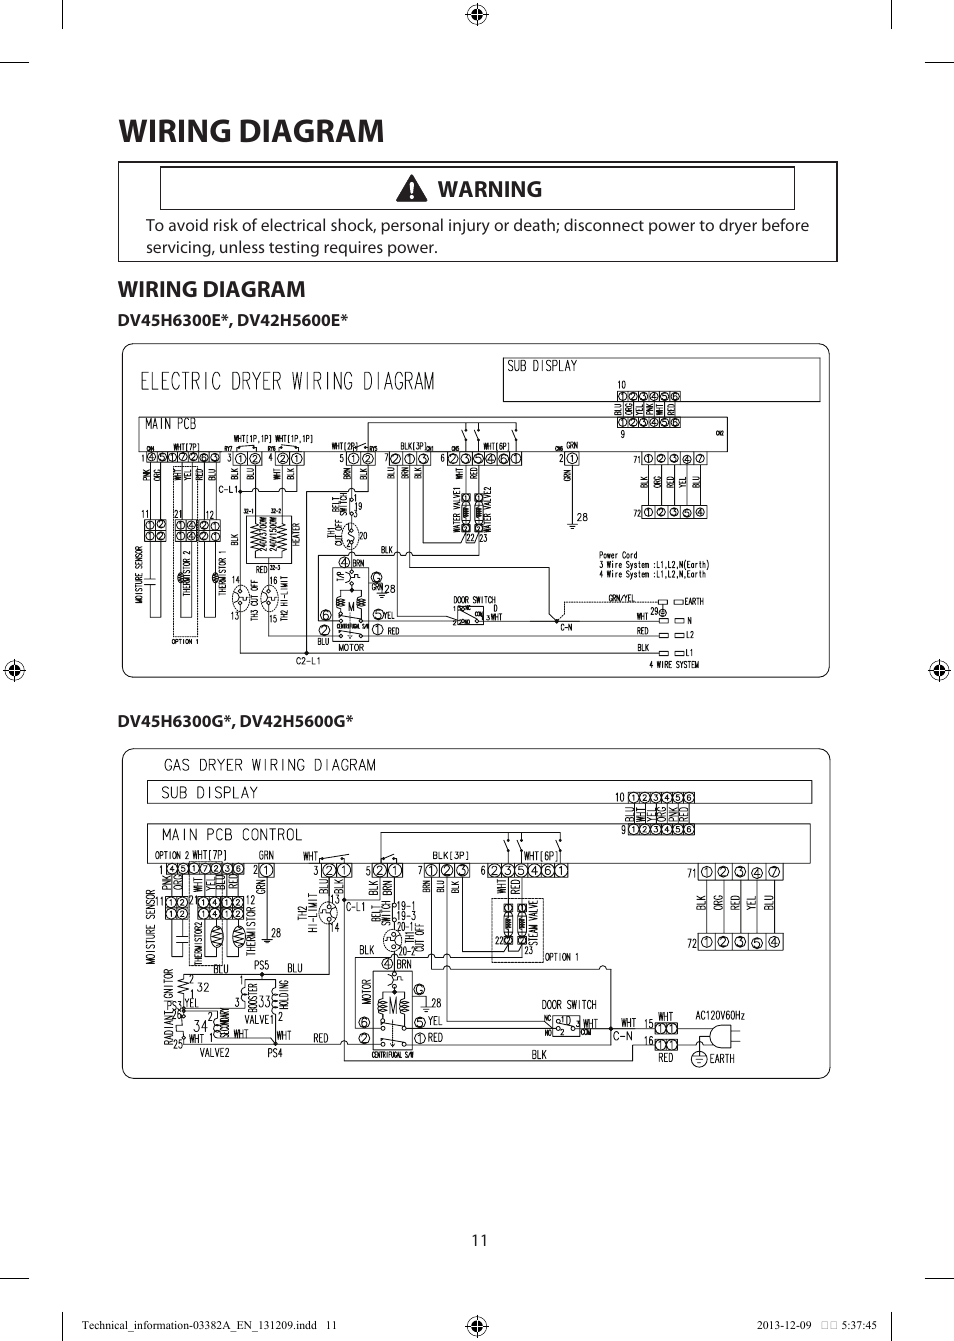 hight resolution of wiring diagram warning samsung dv42h5200ef a3 user manual page 3g wiring schematic samsung wiring schematic